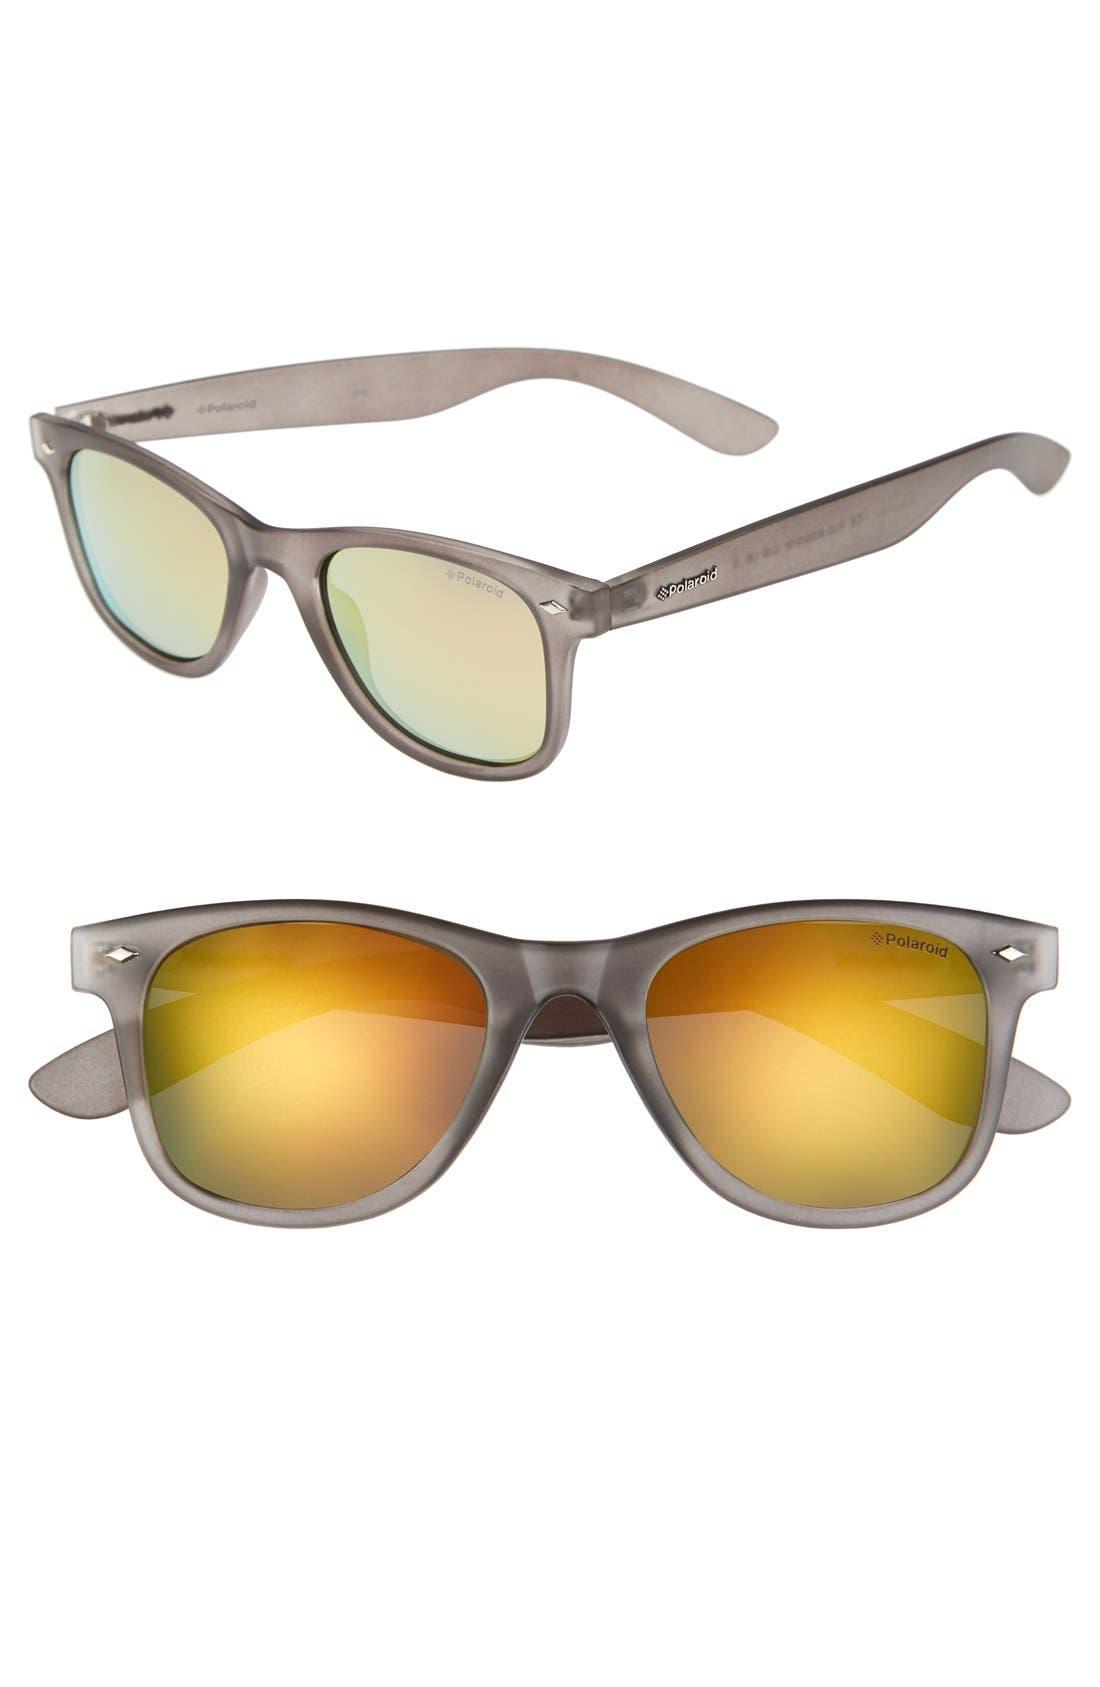 POLAROID EYEWEAR, '6009SM' 50mm Polarized Retro Sunglasses, Main thumbnail 1, color, 020